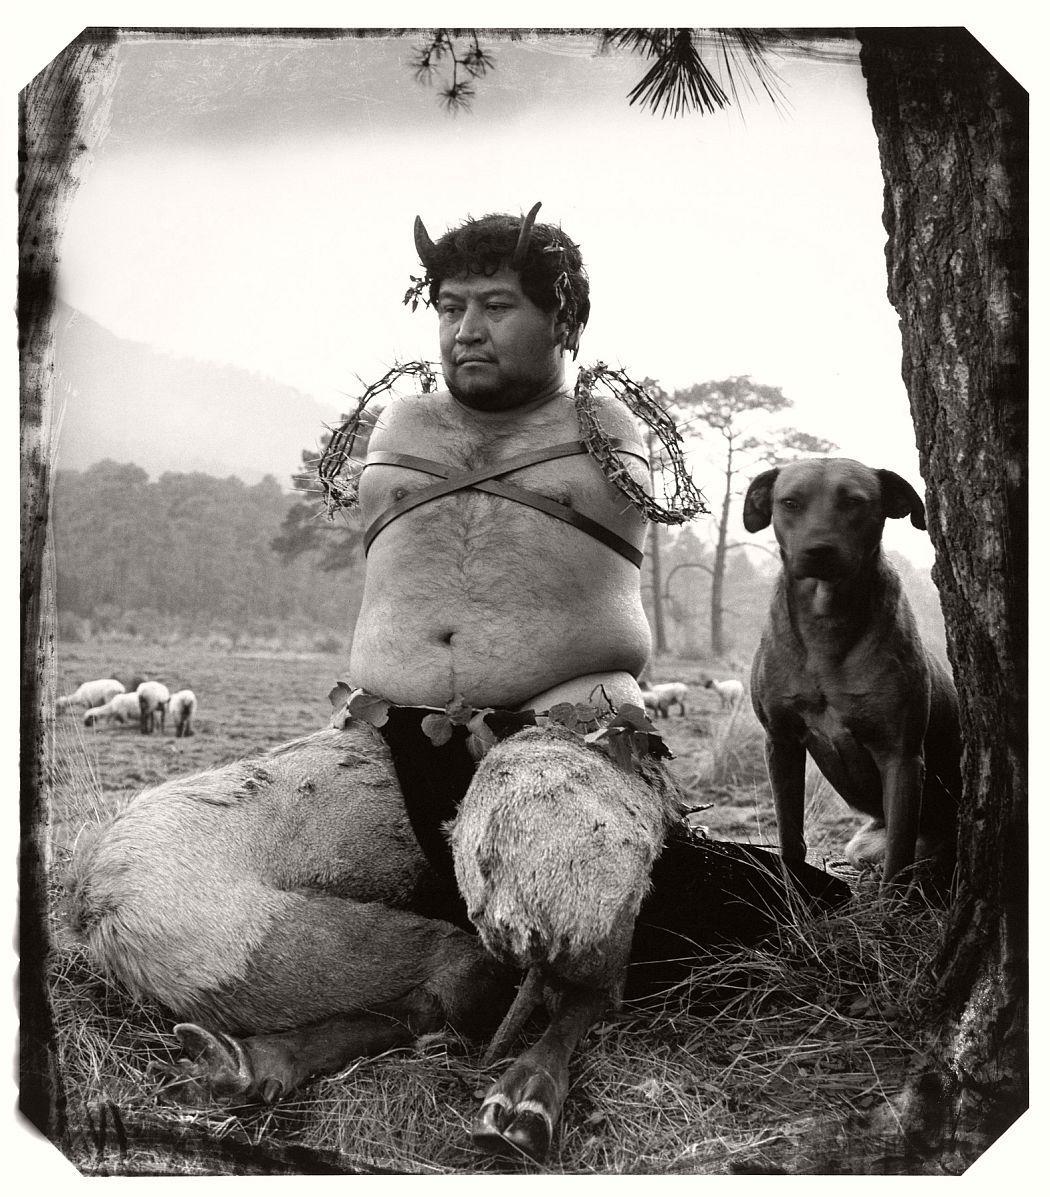 Satiro, Мексика, 1992